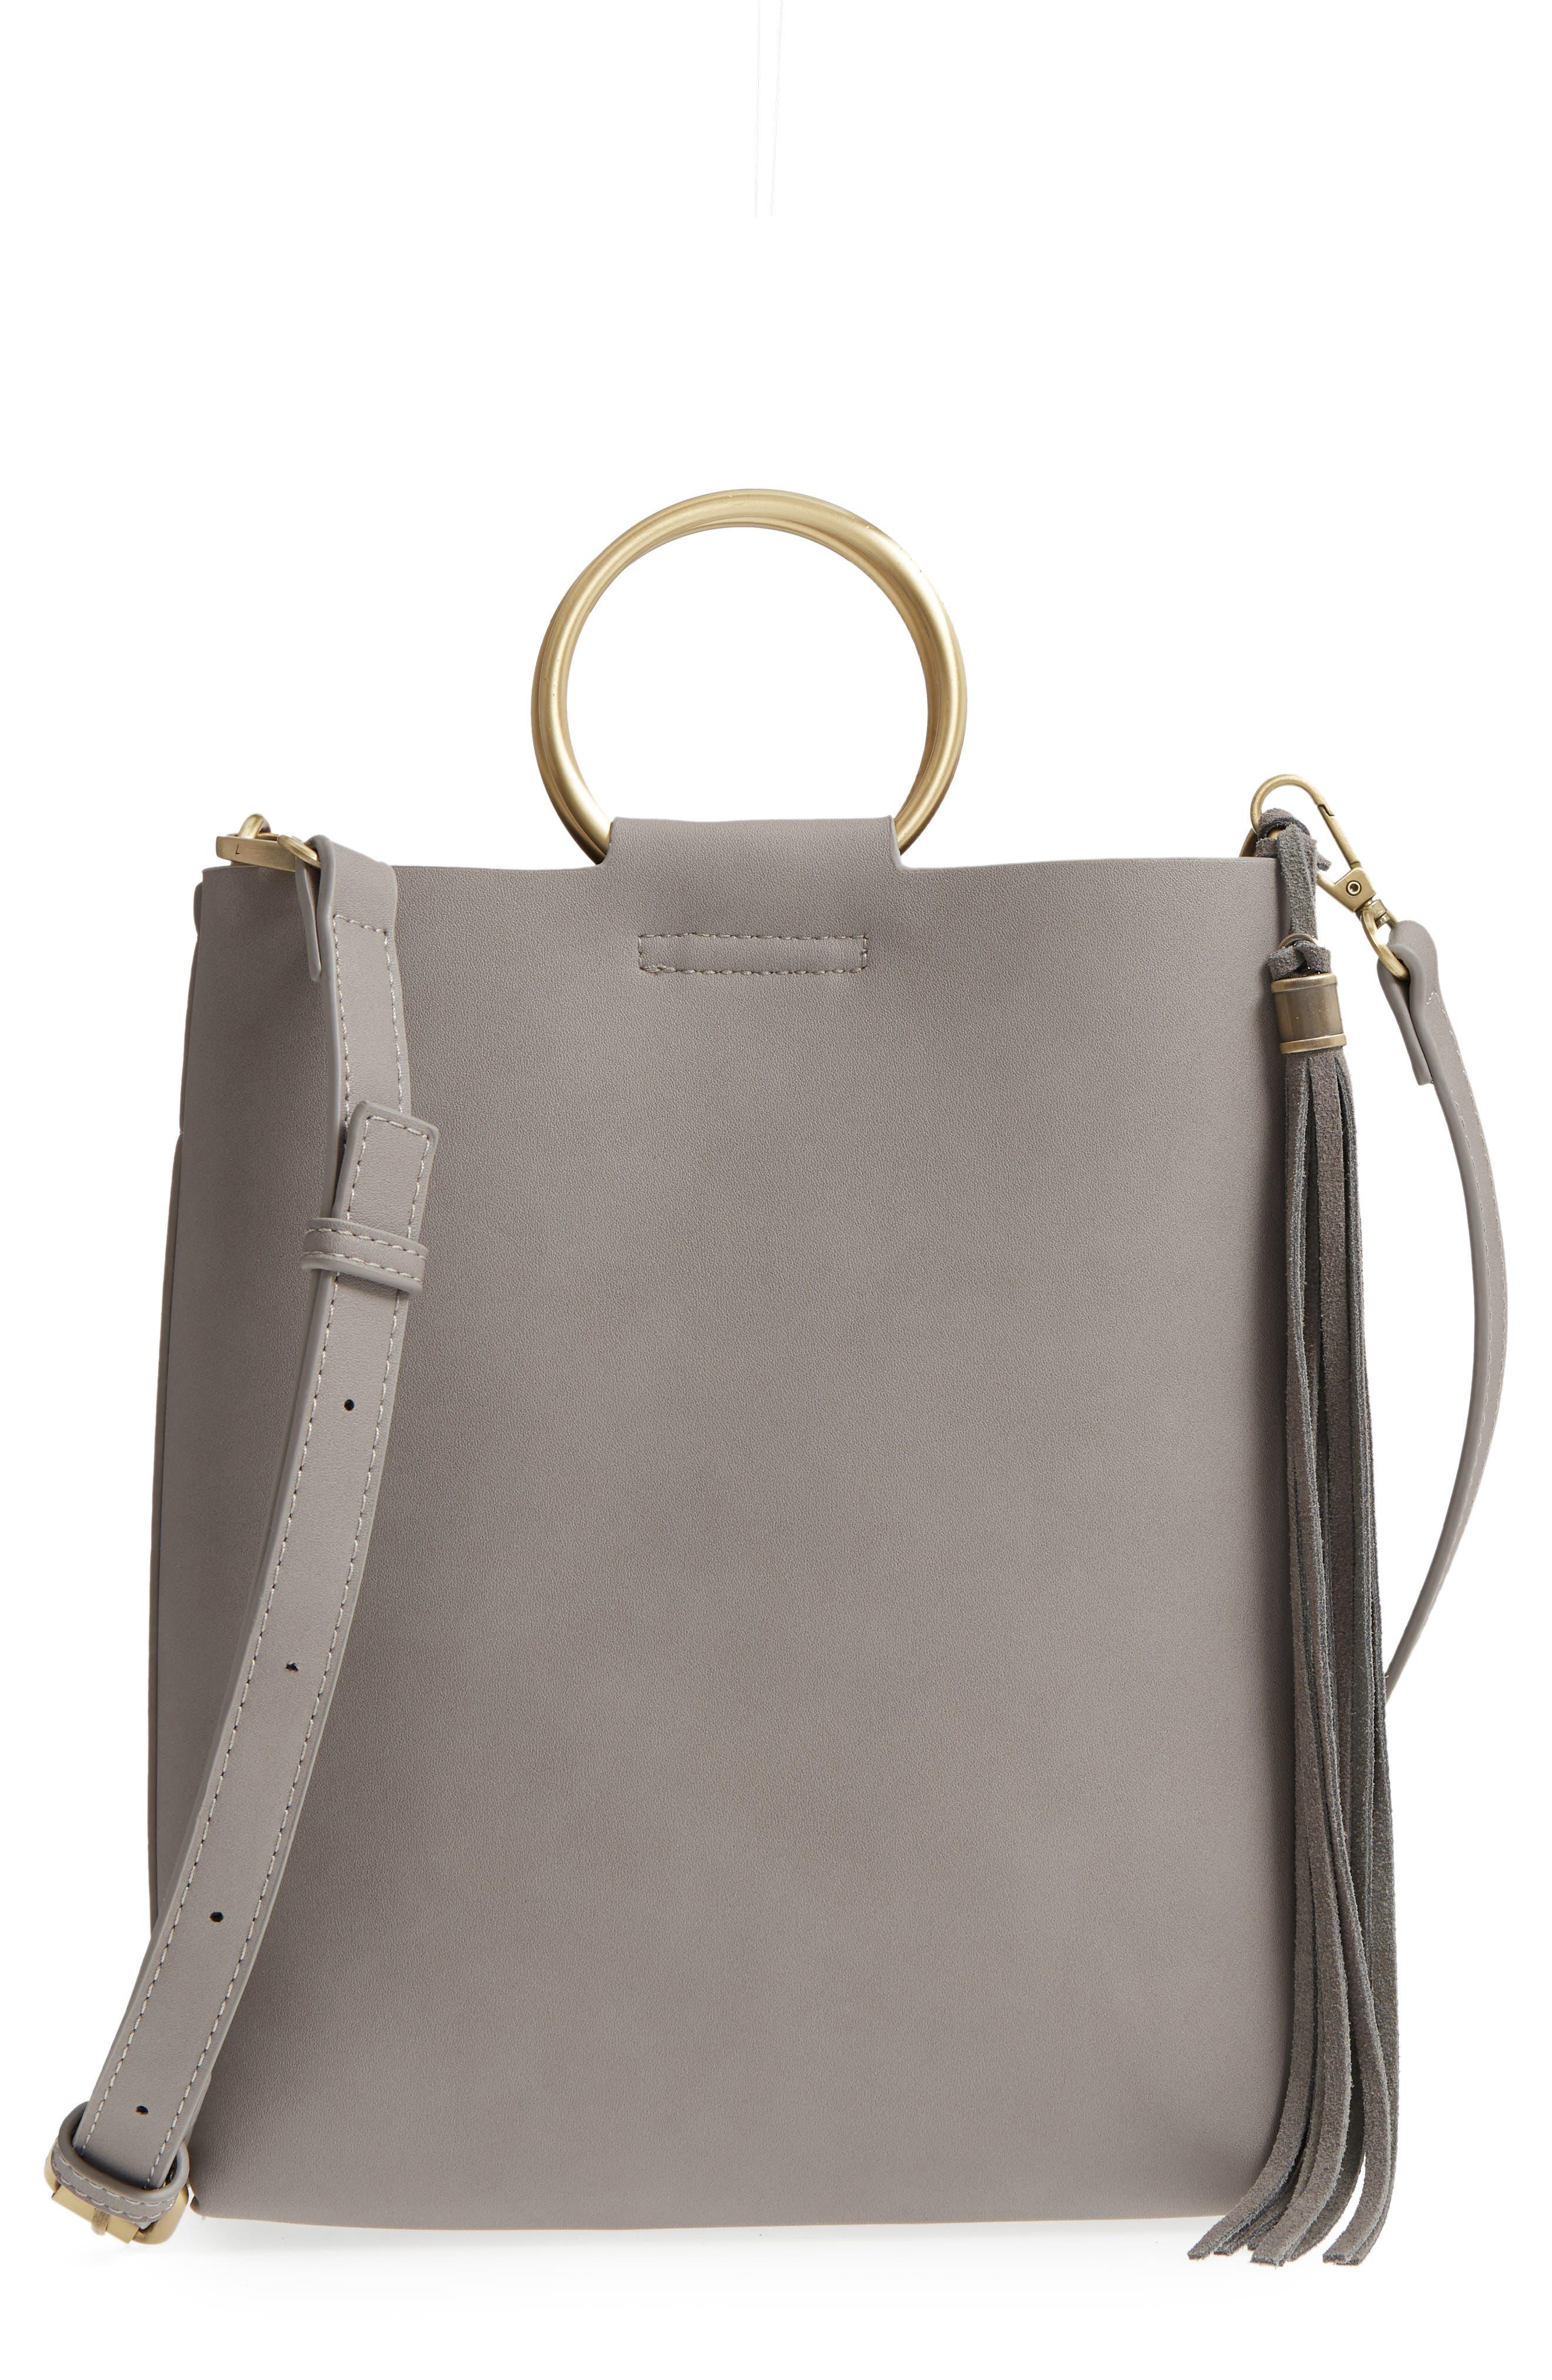 Street Level Metal Handle Faux Leather Crossbody Bag